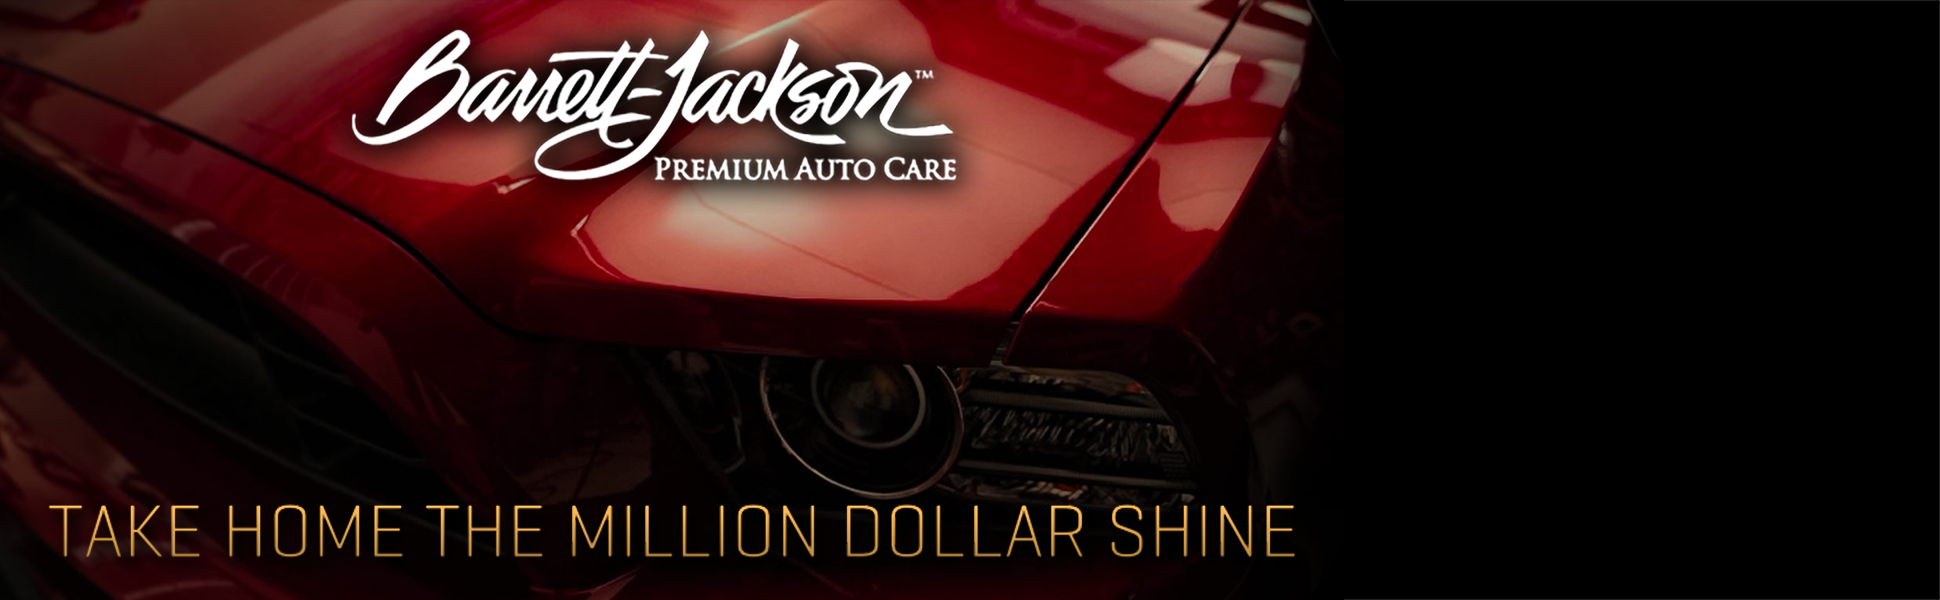 Barrett Jackson Car Care Products Reviews